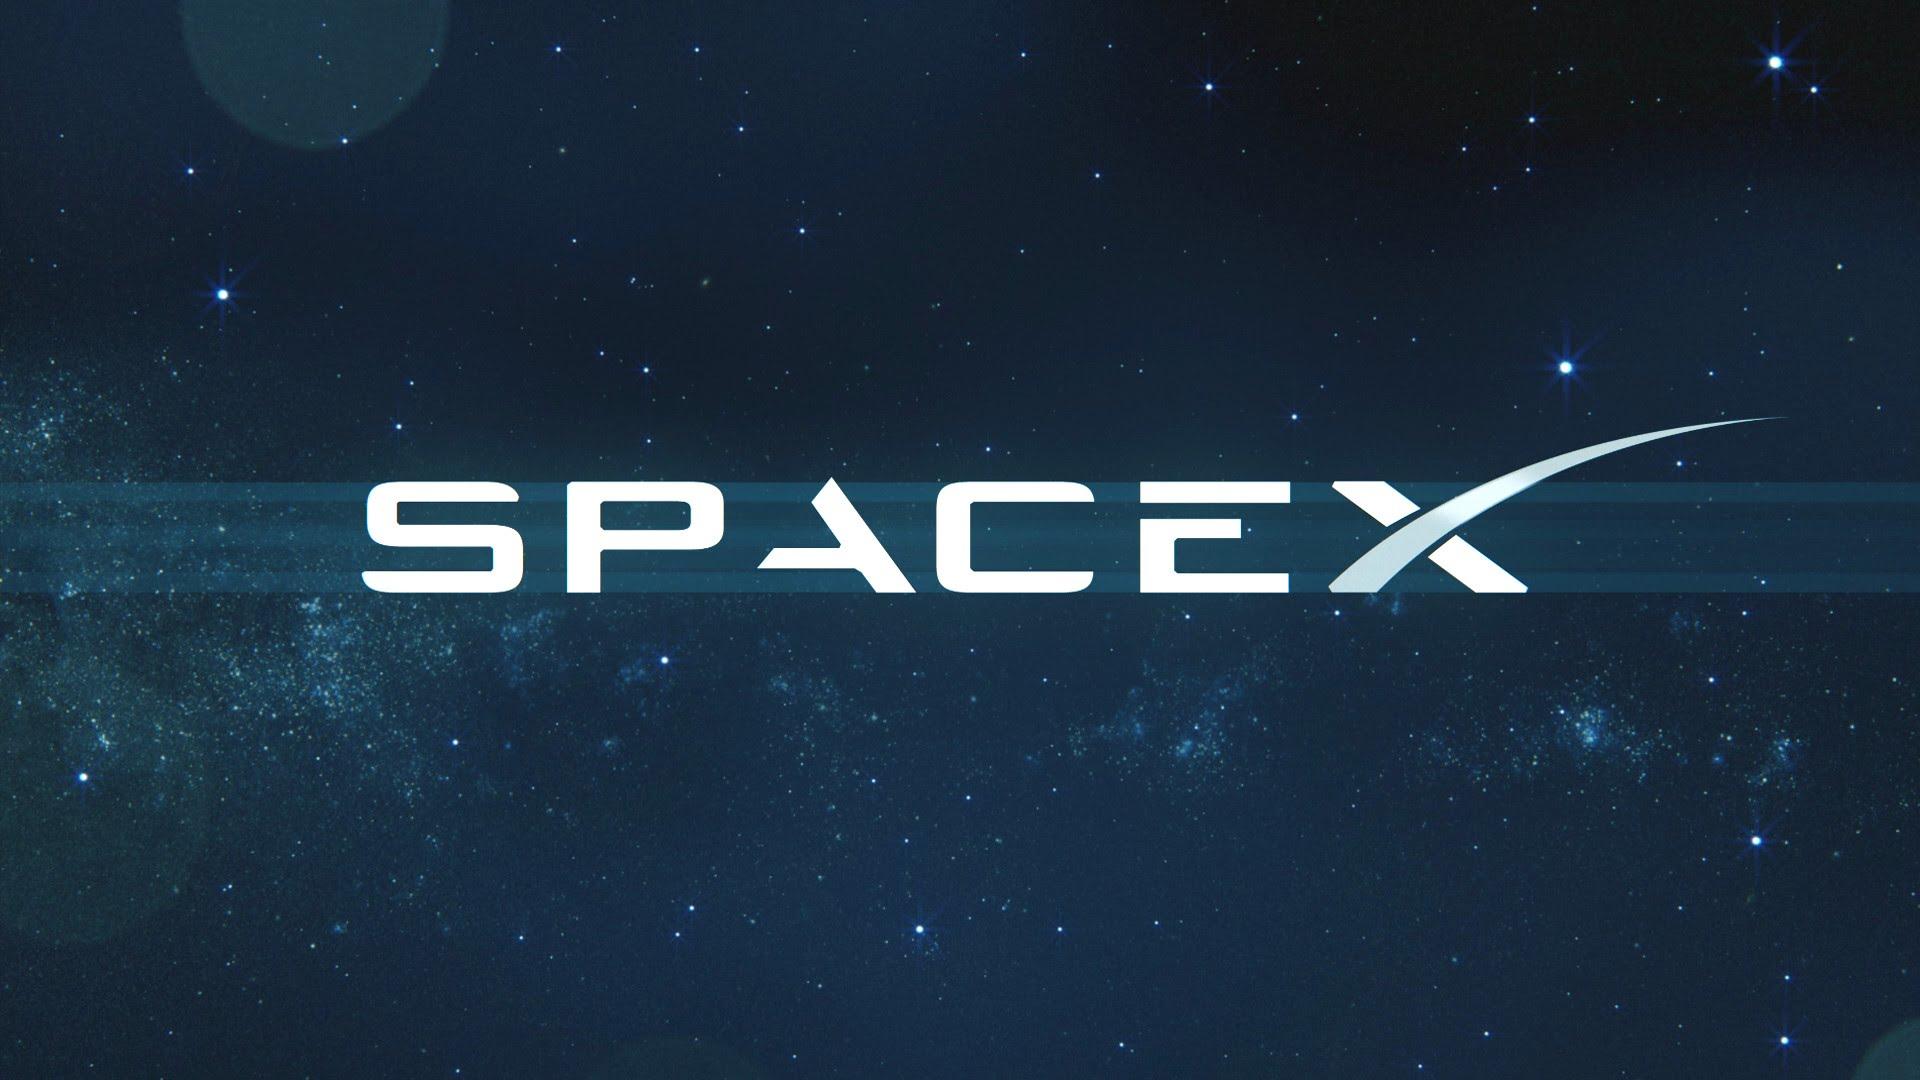 SpaceX перенес первый пилотируемый полёт аппарата Dragon на 2018 год?